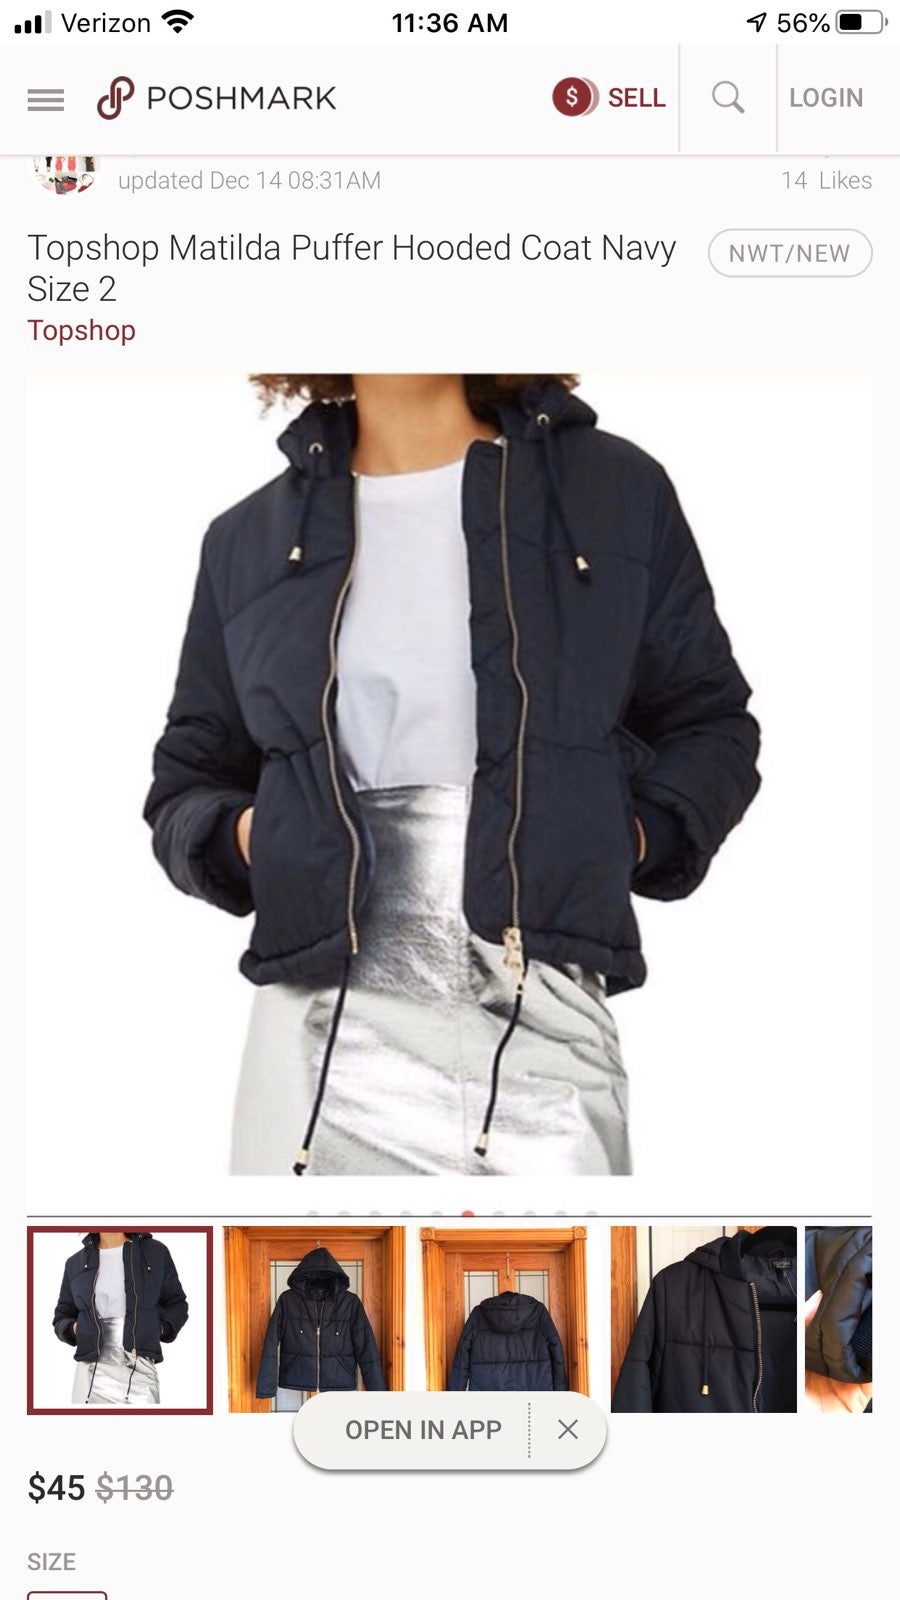 NWOT TOPSHOP Matilda Puffer Coat - Size